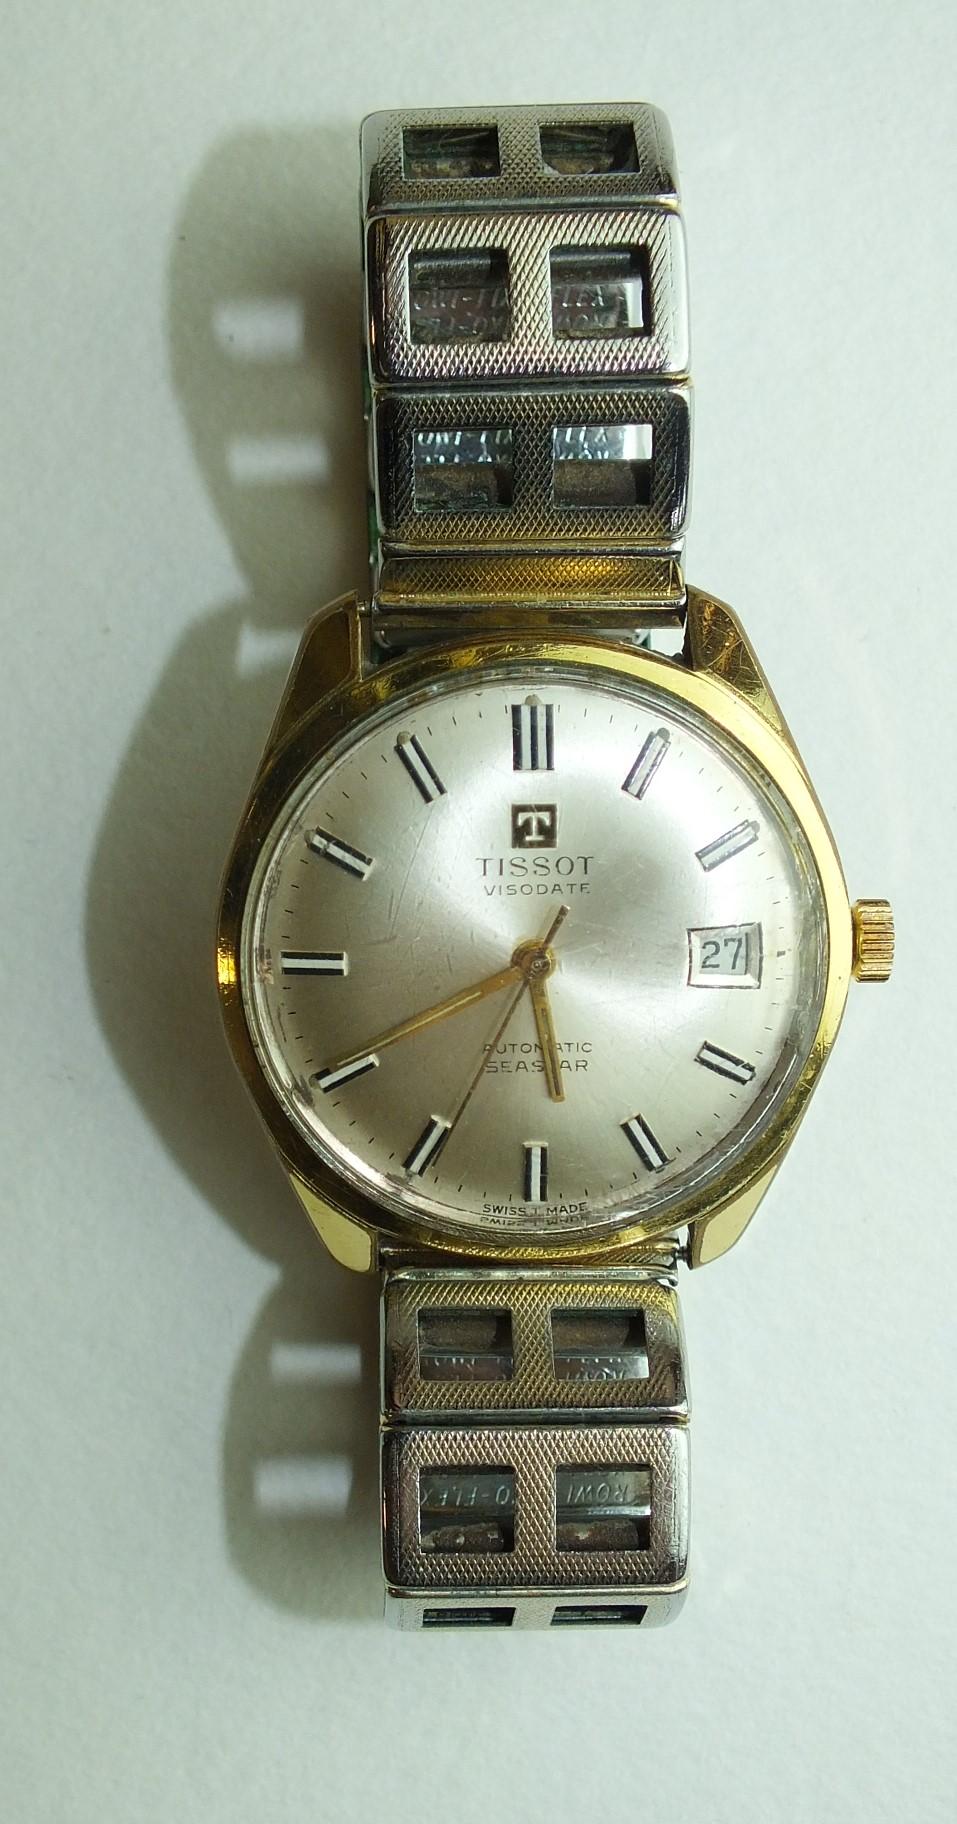 Lot 269 - Tissot, a gentleman's Visodate Automatic Seastar gold-plated wrist watch, on plated bracelet.